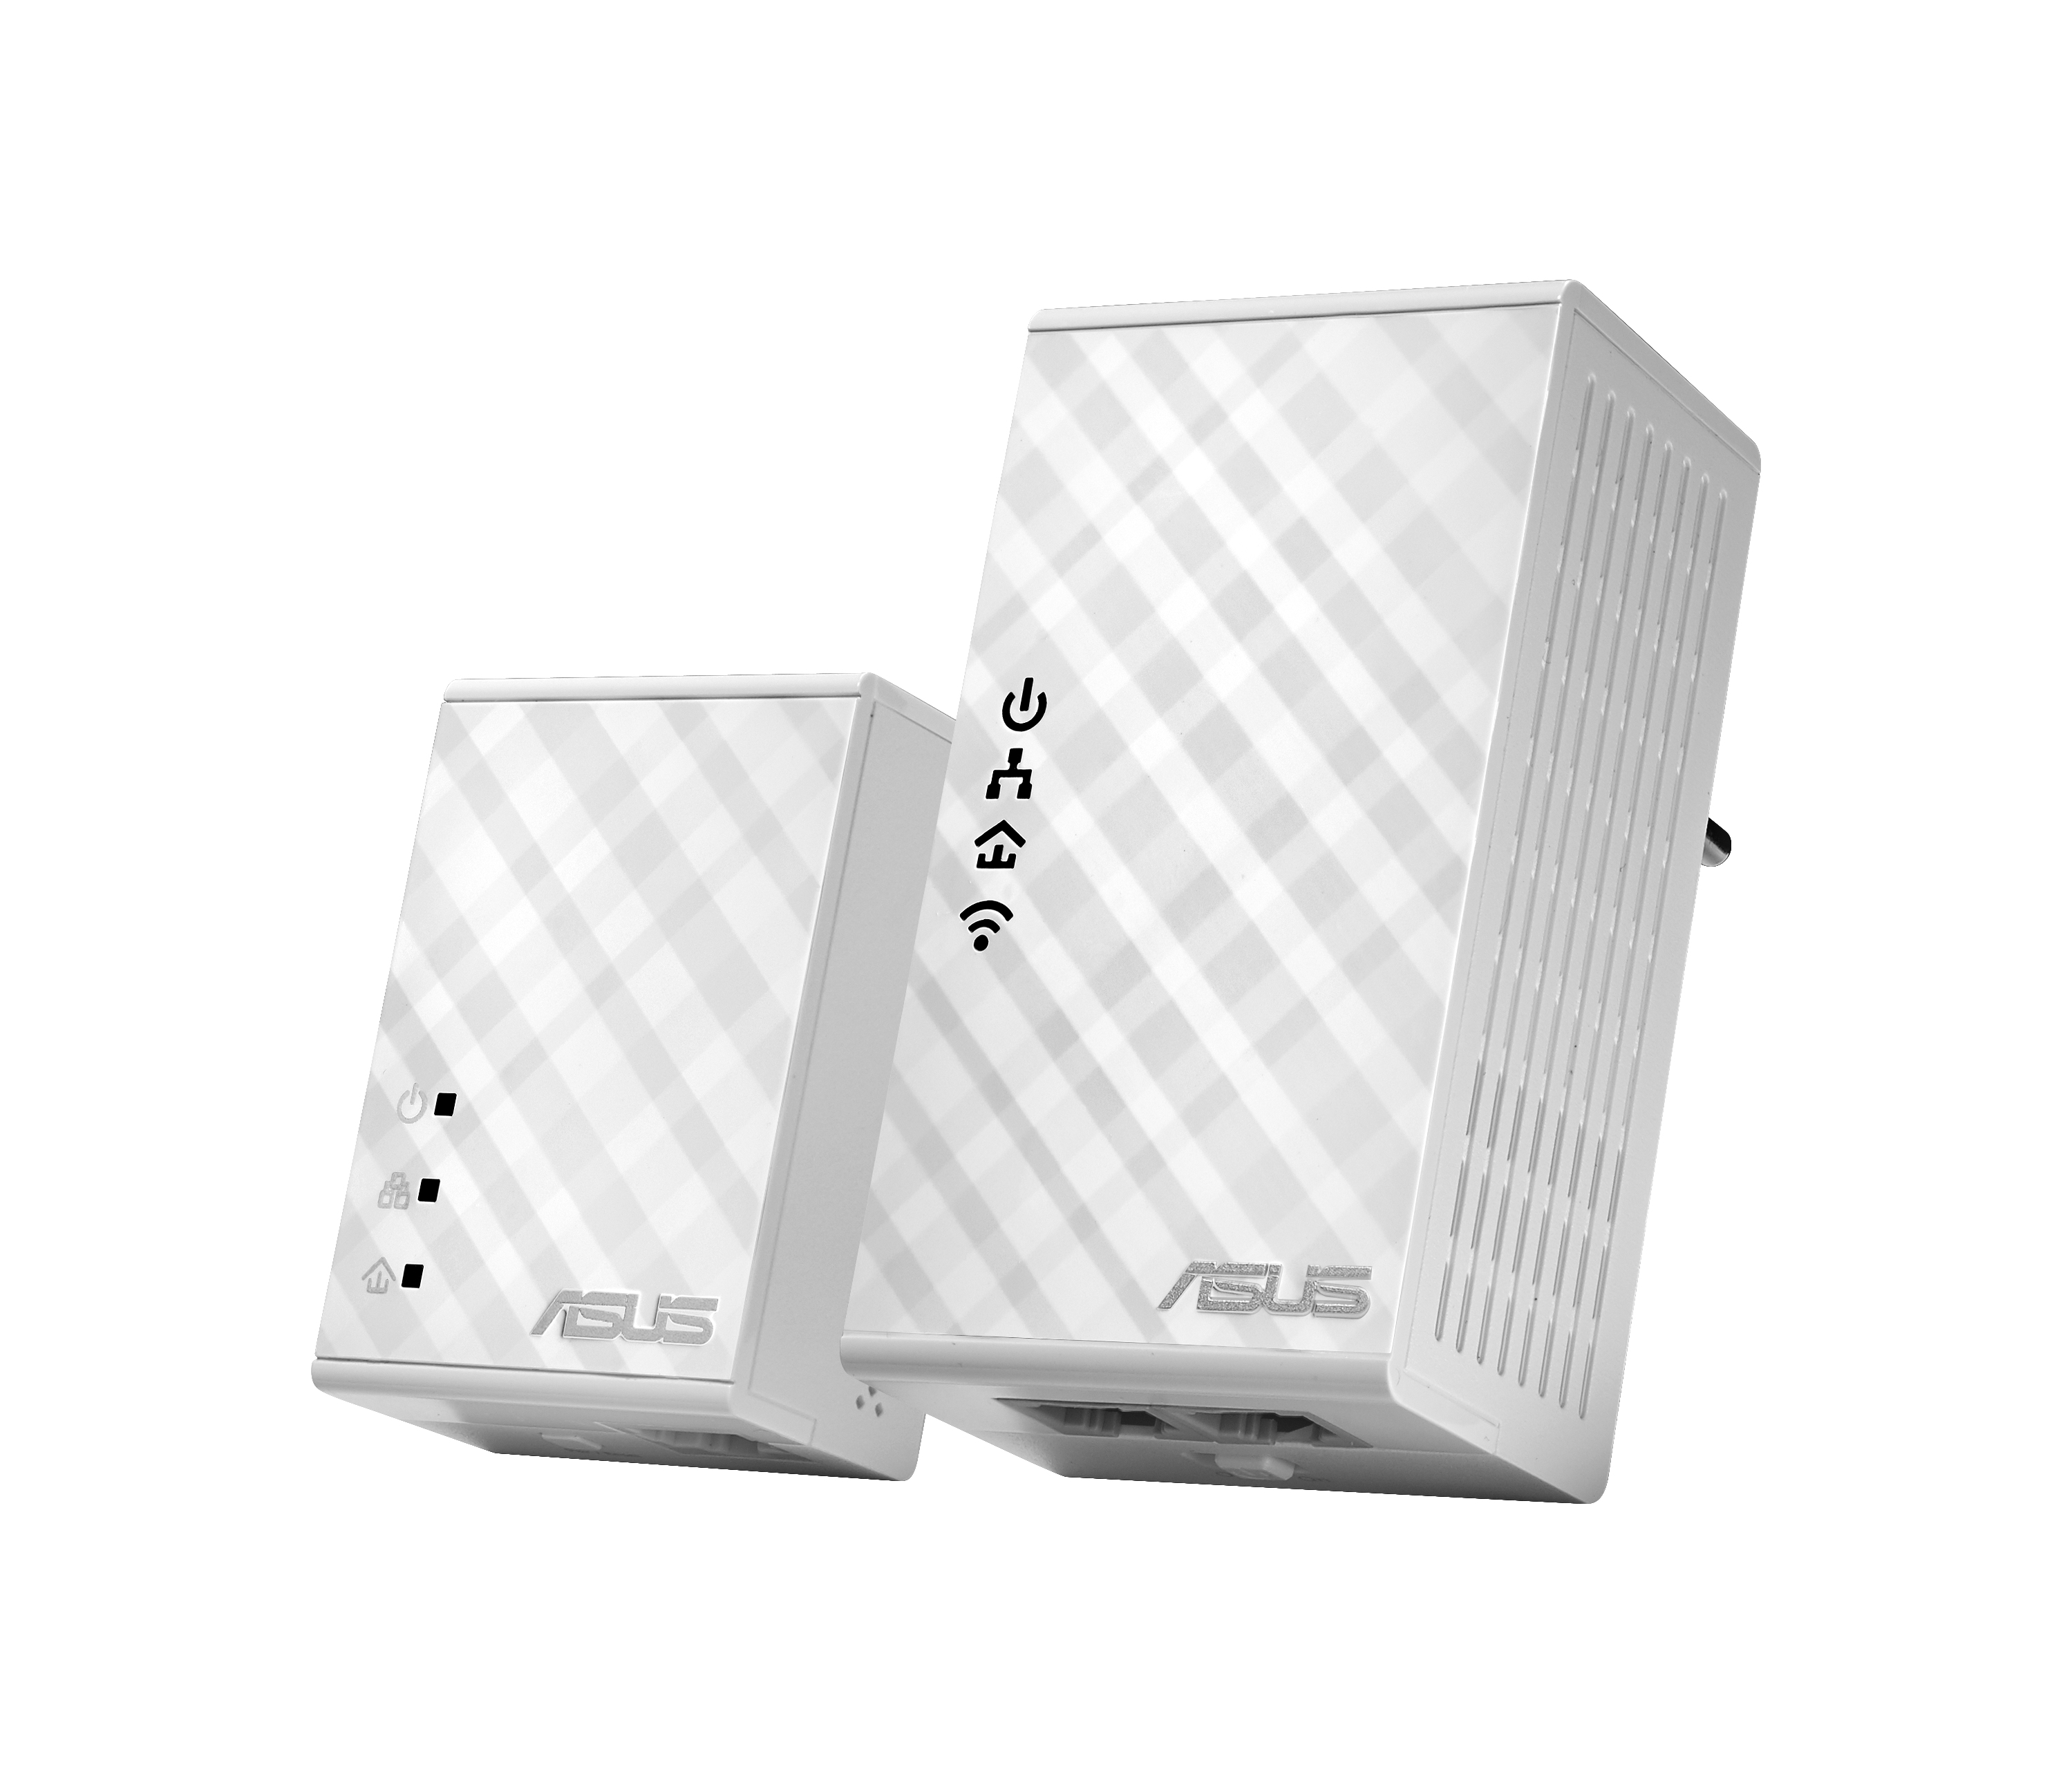 ASUS PL-N12 Kit - Bridge - 2-Port-Switch